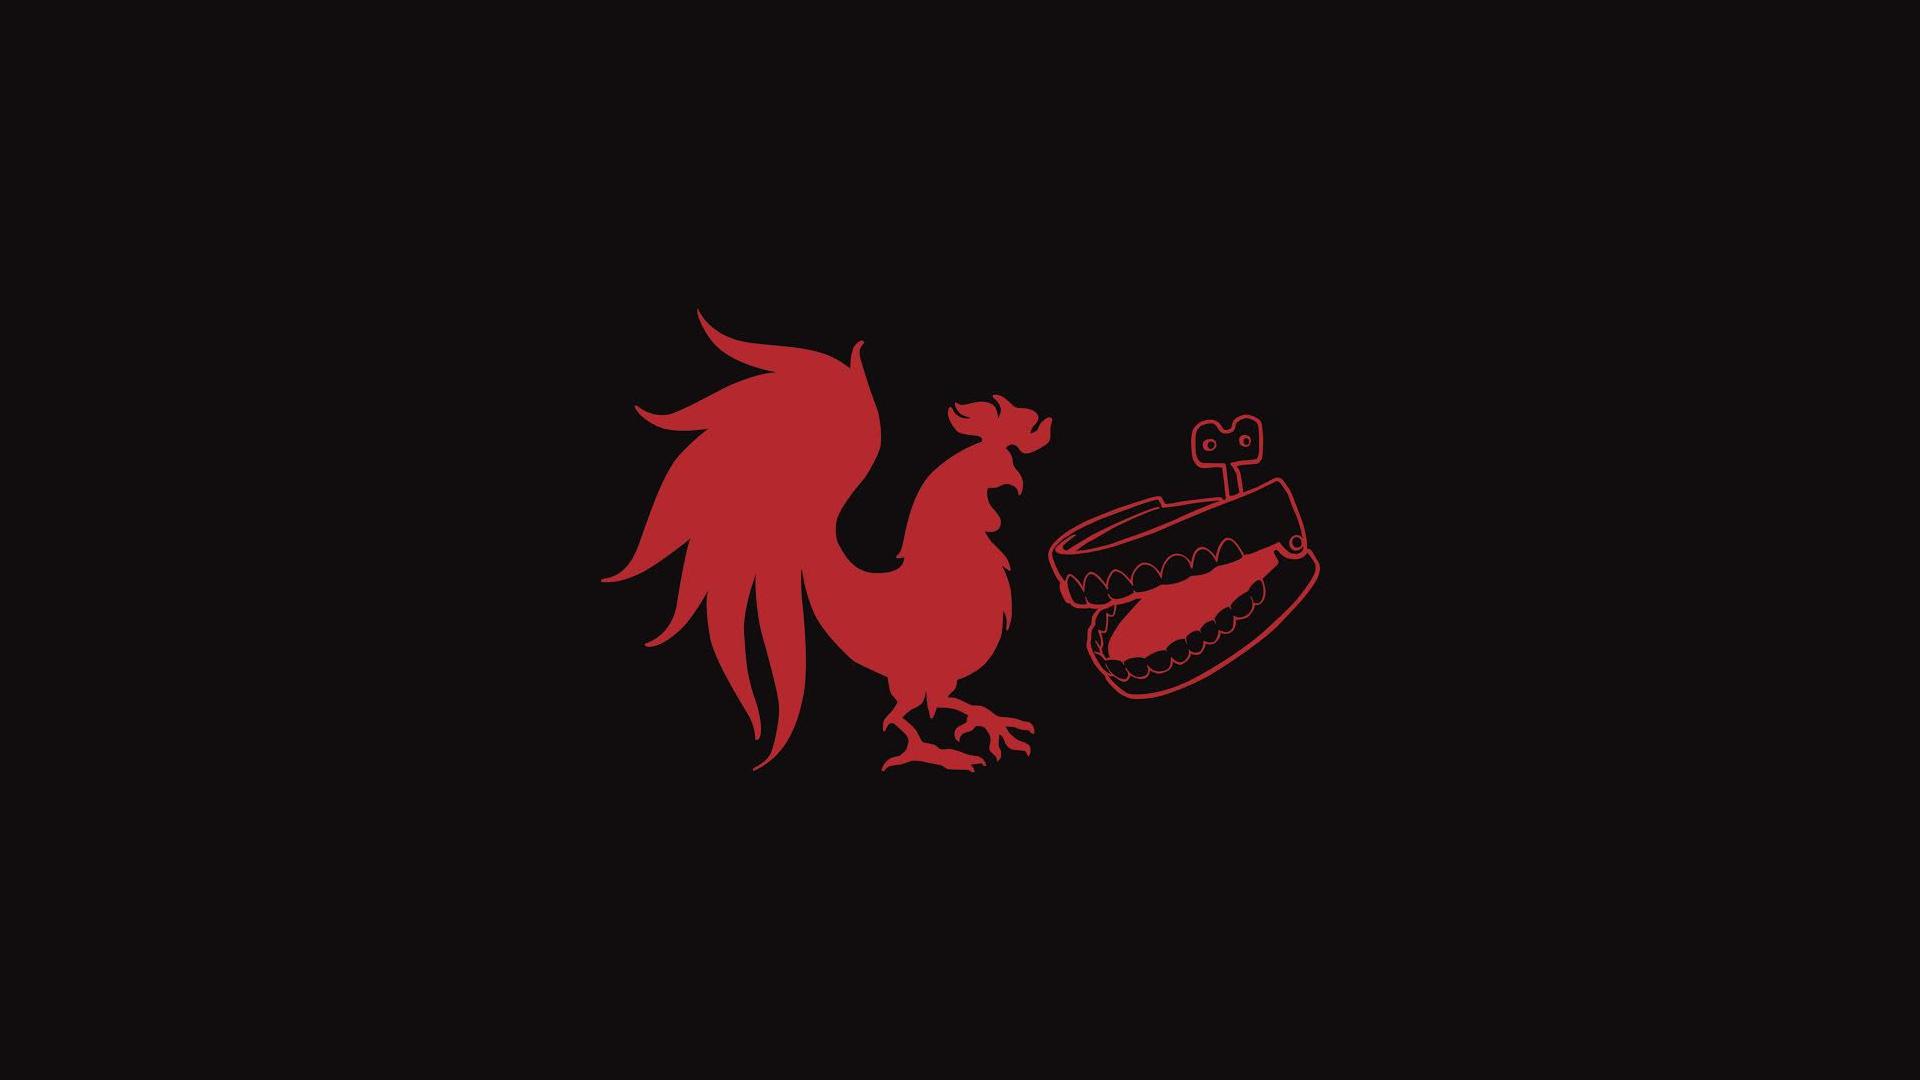 Rooster Teeth Logo by ORANGEMAN80 on DeviantArt